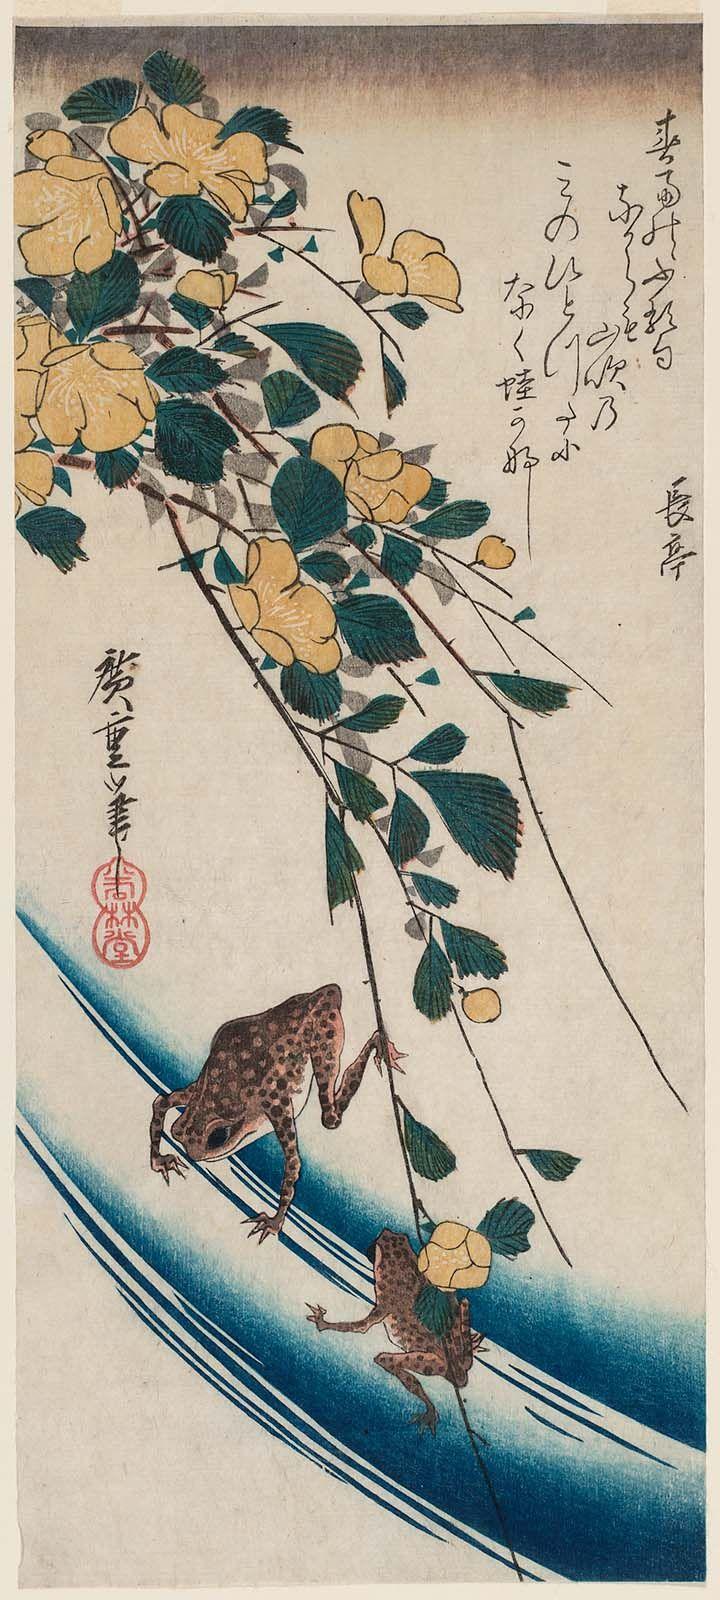 「frog hiroshige pinterest」の画像検索結果